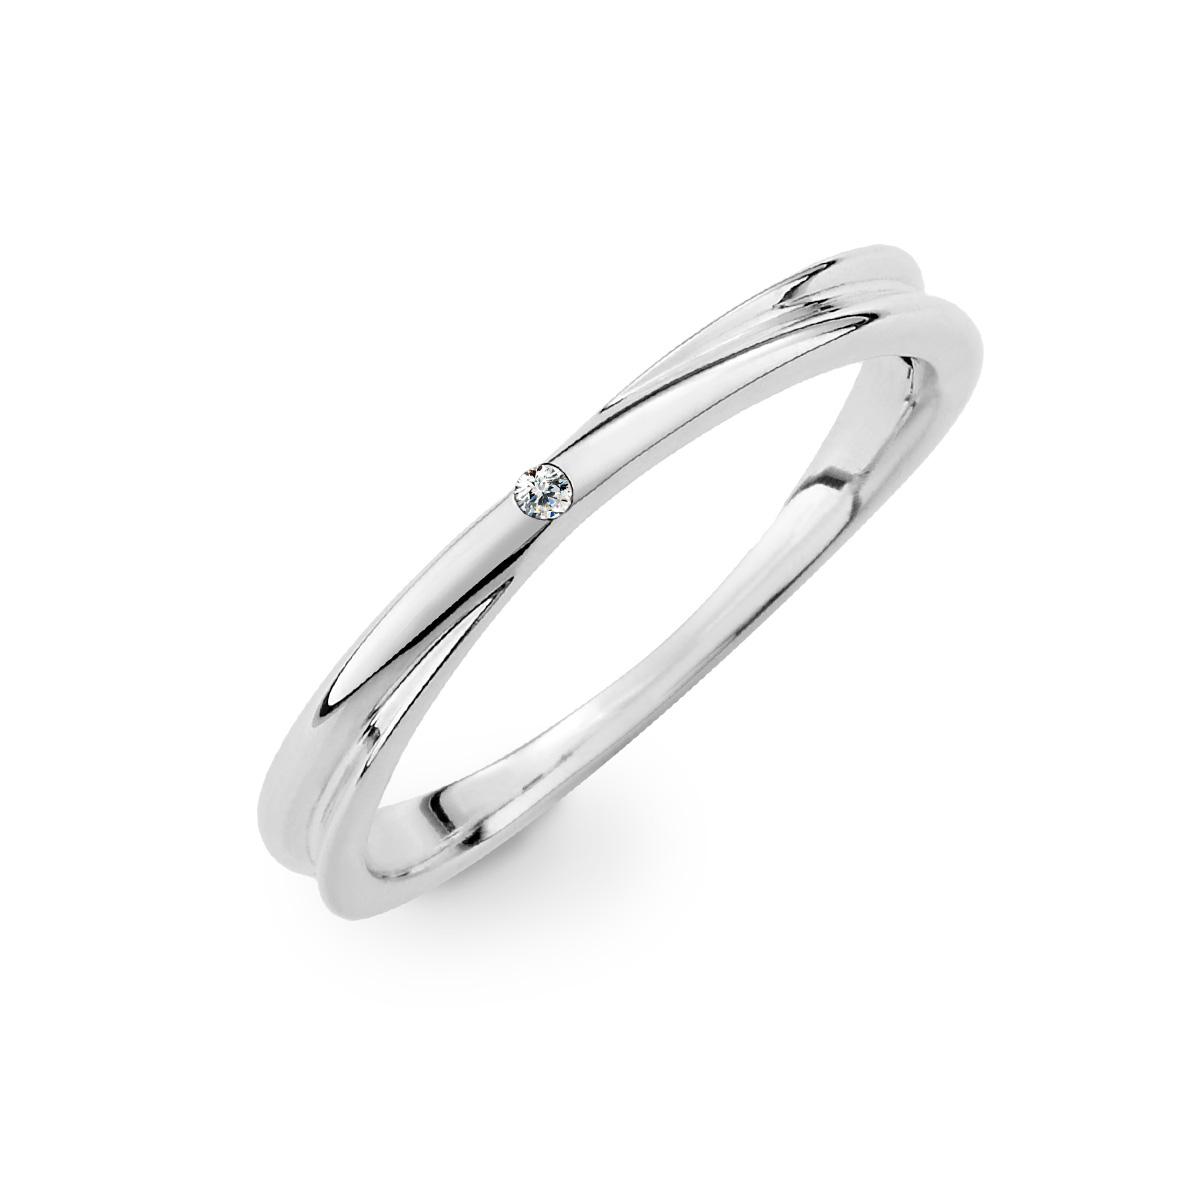 KSW337 經典素面單鑽交叉純銀戒指